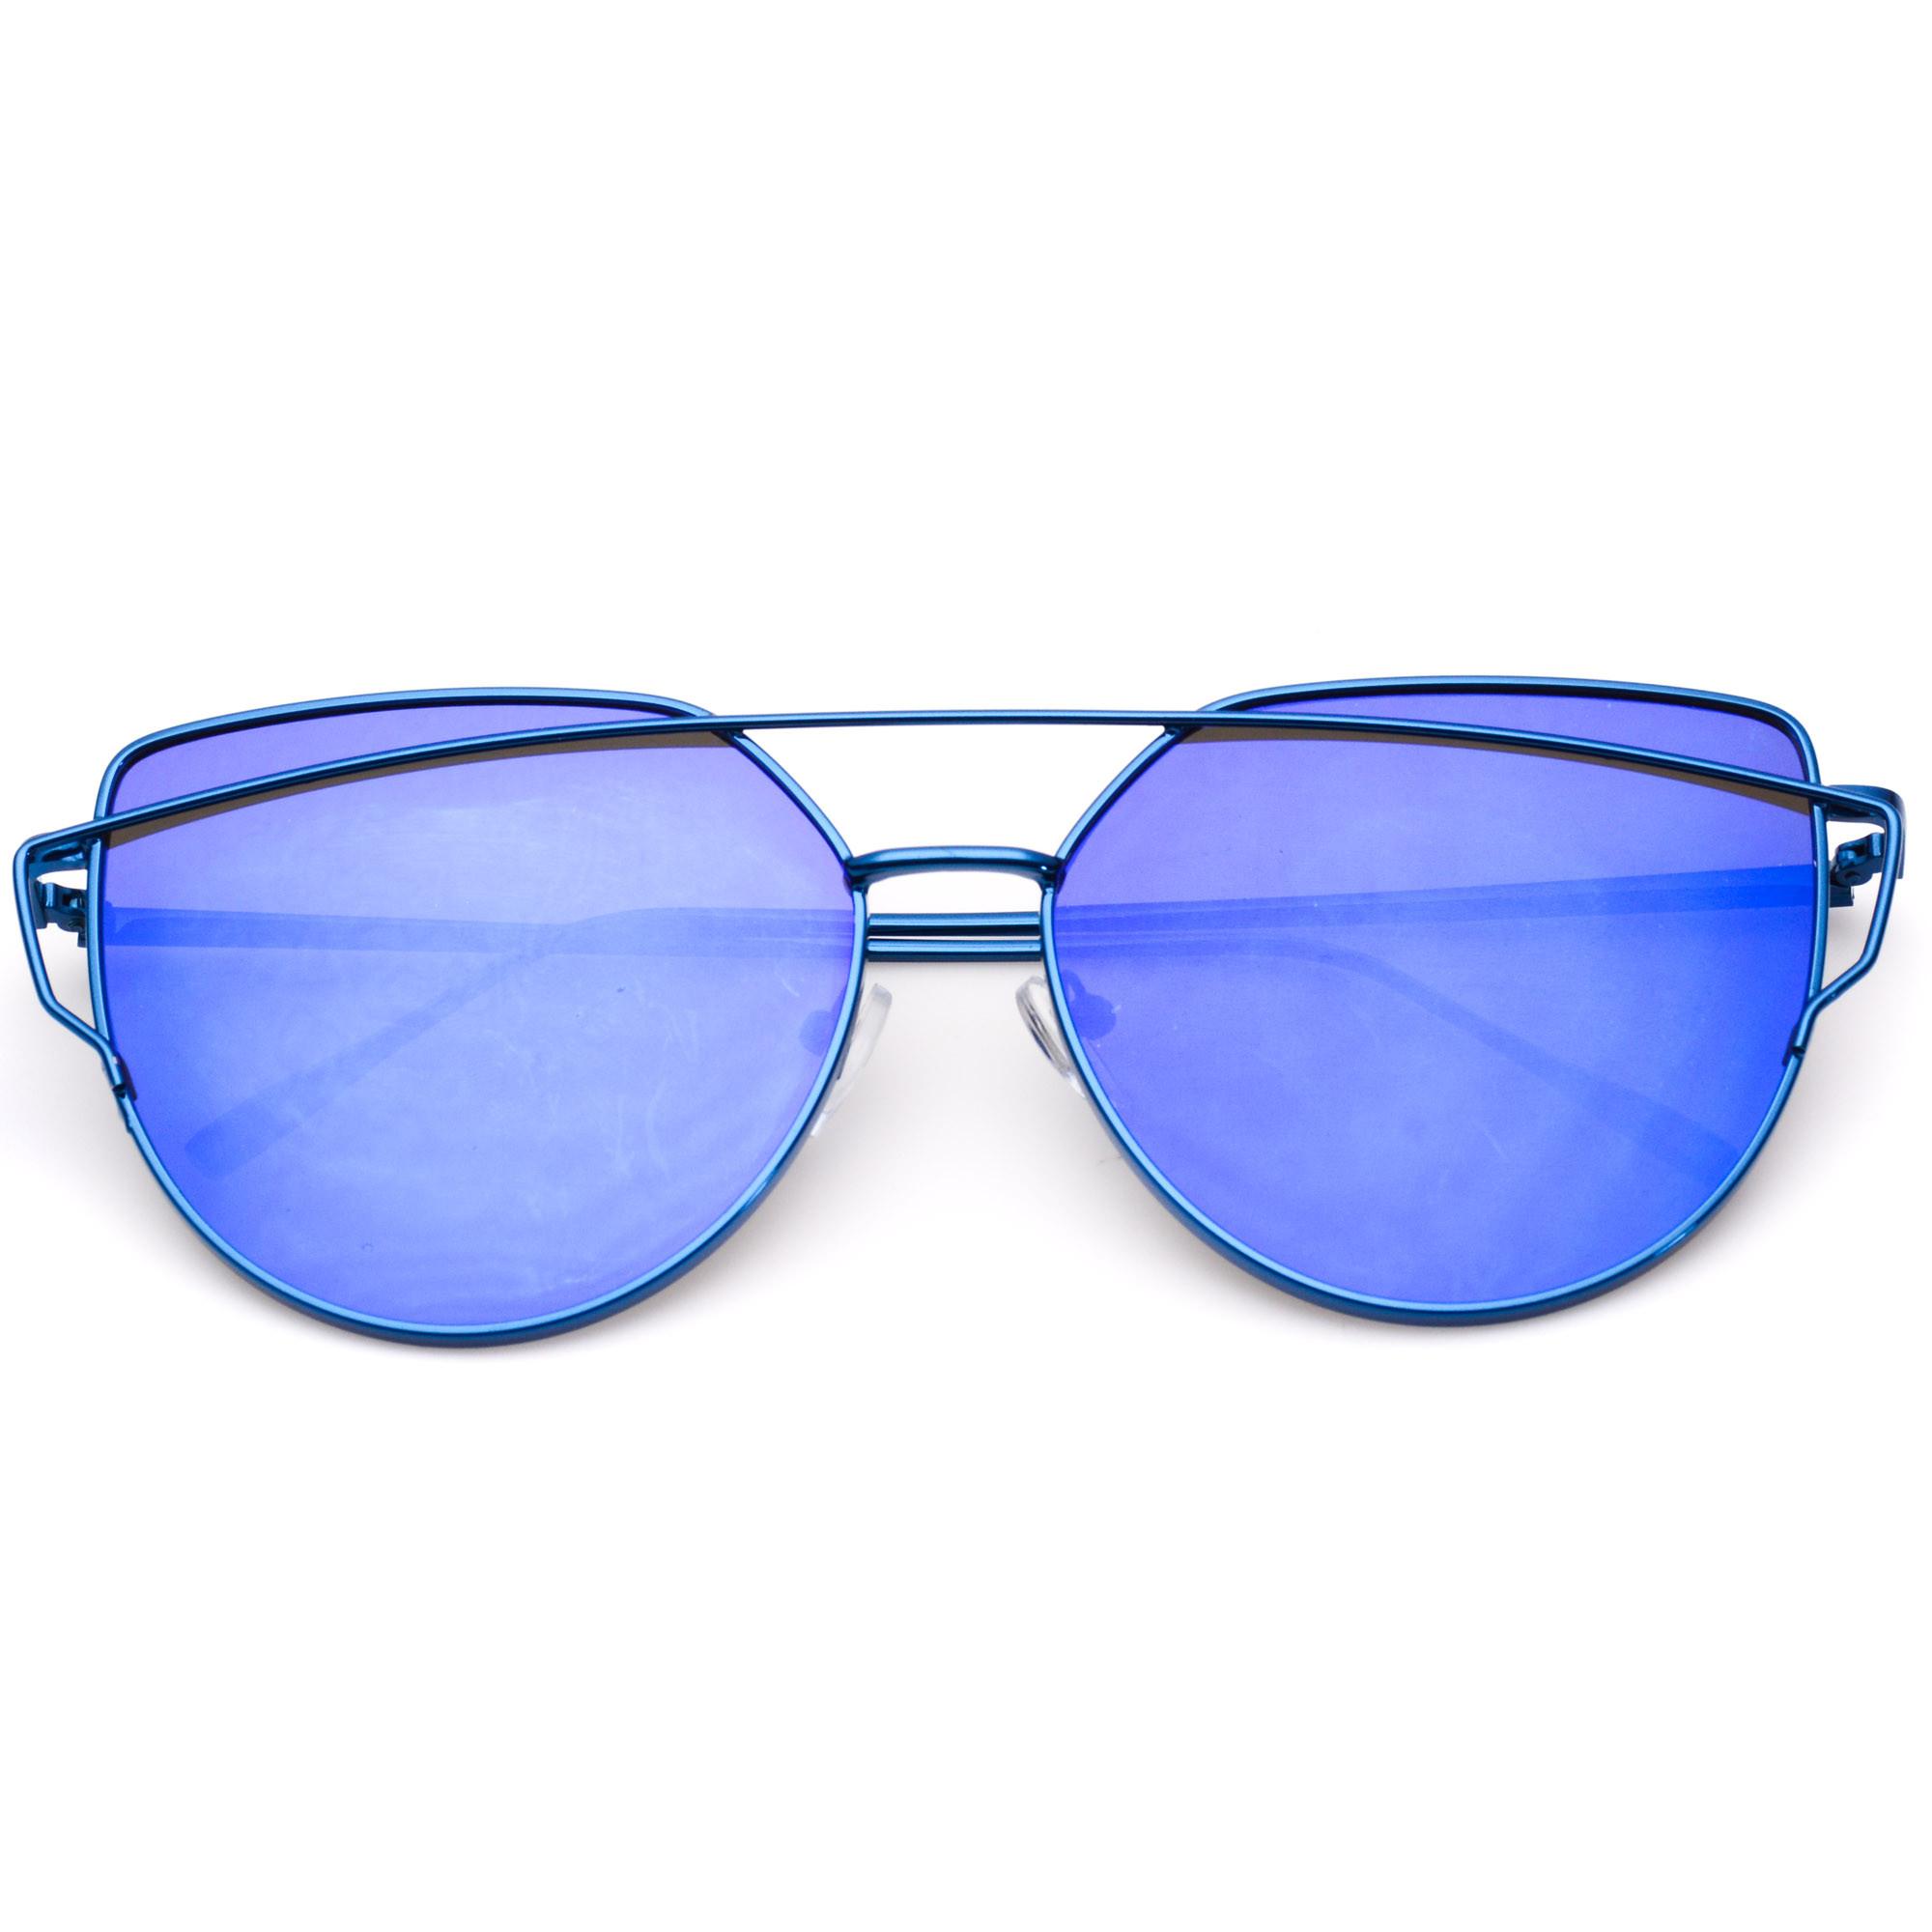 77e7ac488b7 Blue Cat Eye Aviator Sunglasses